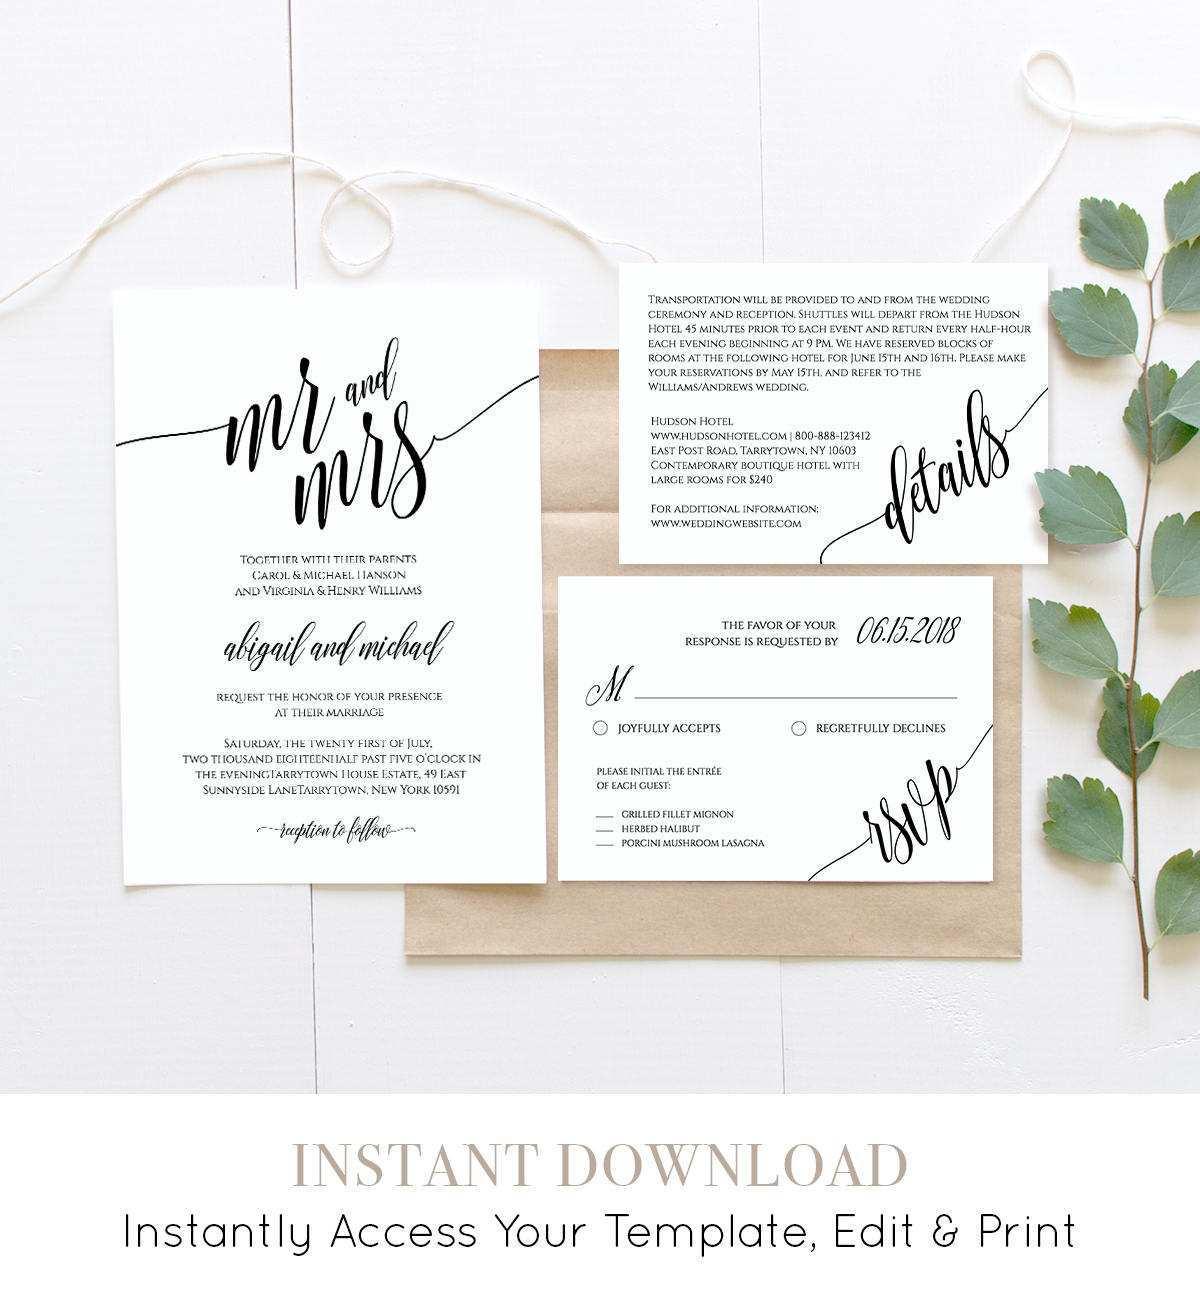 78 Adding Wedding Invitation Template Rsvp for Ms Word by Wedding Invitation Template Rsvp